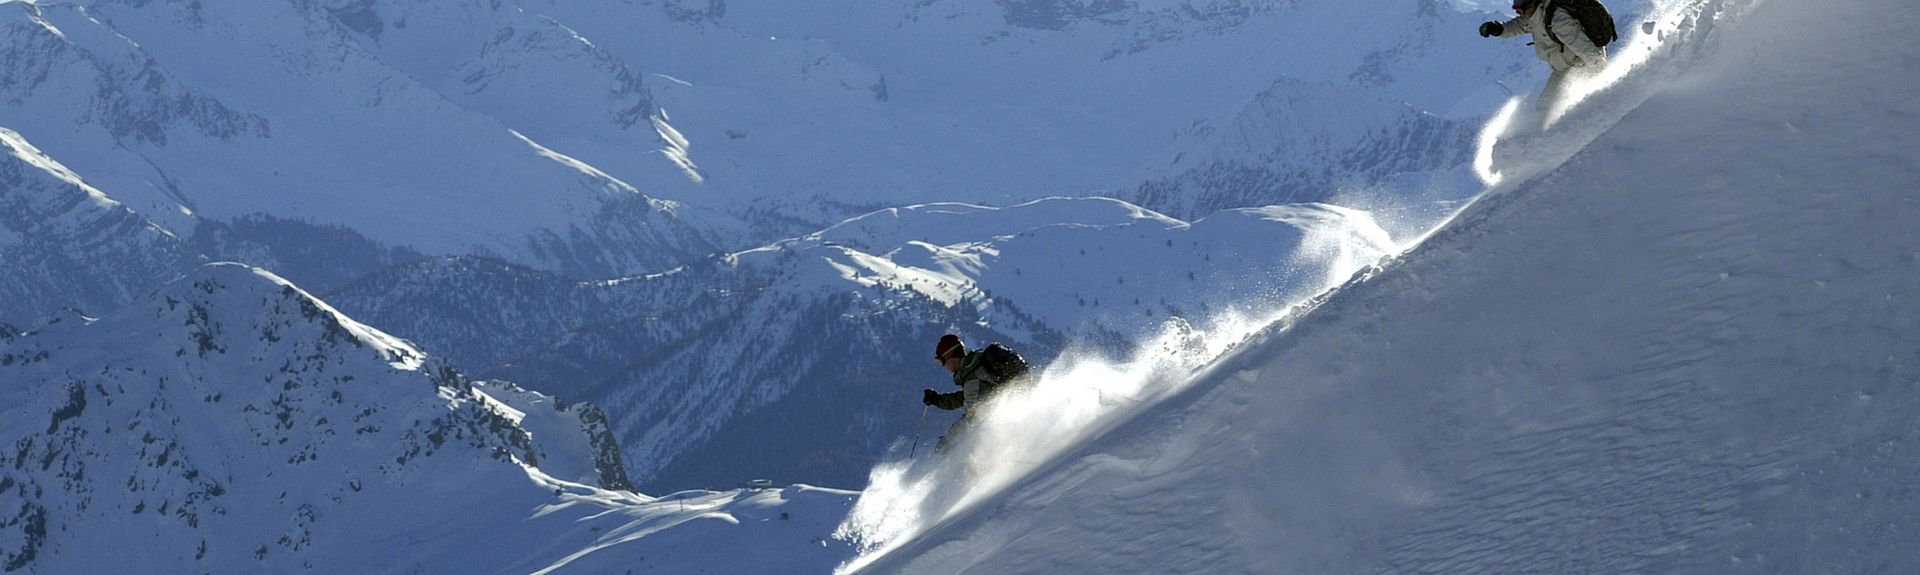 Serre Chevalier, La Salle-les-Alpes, Hautes-Alpes, Frankrijk